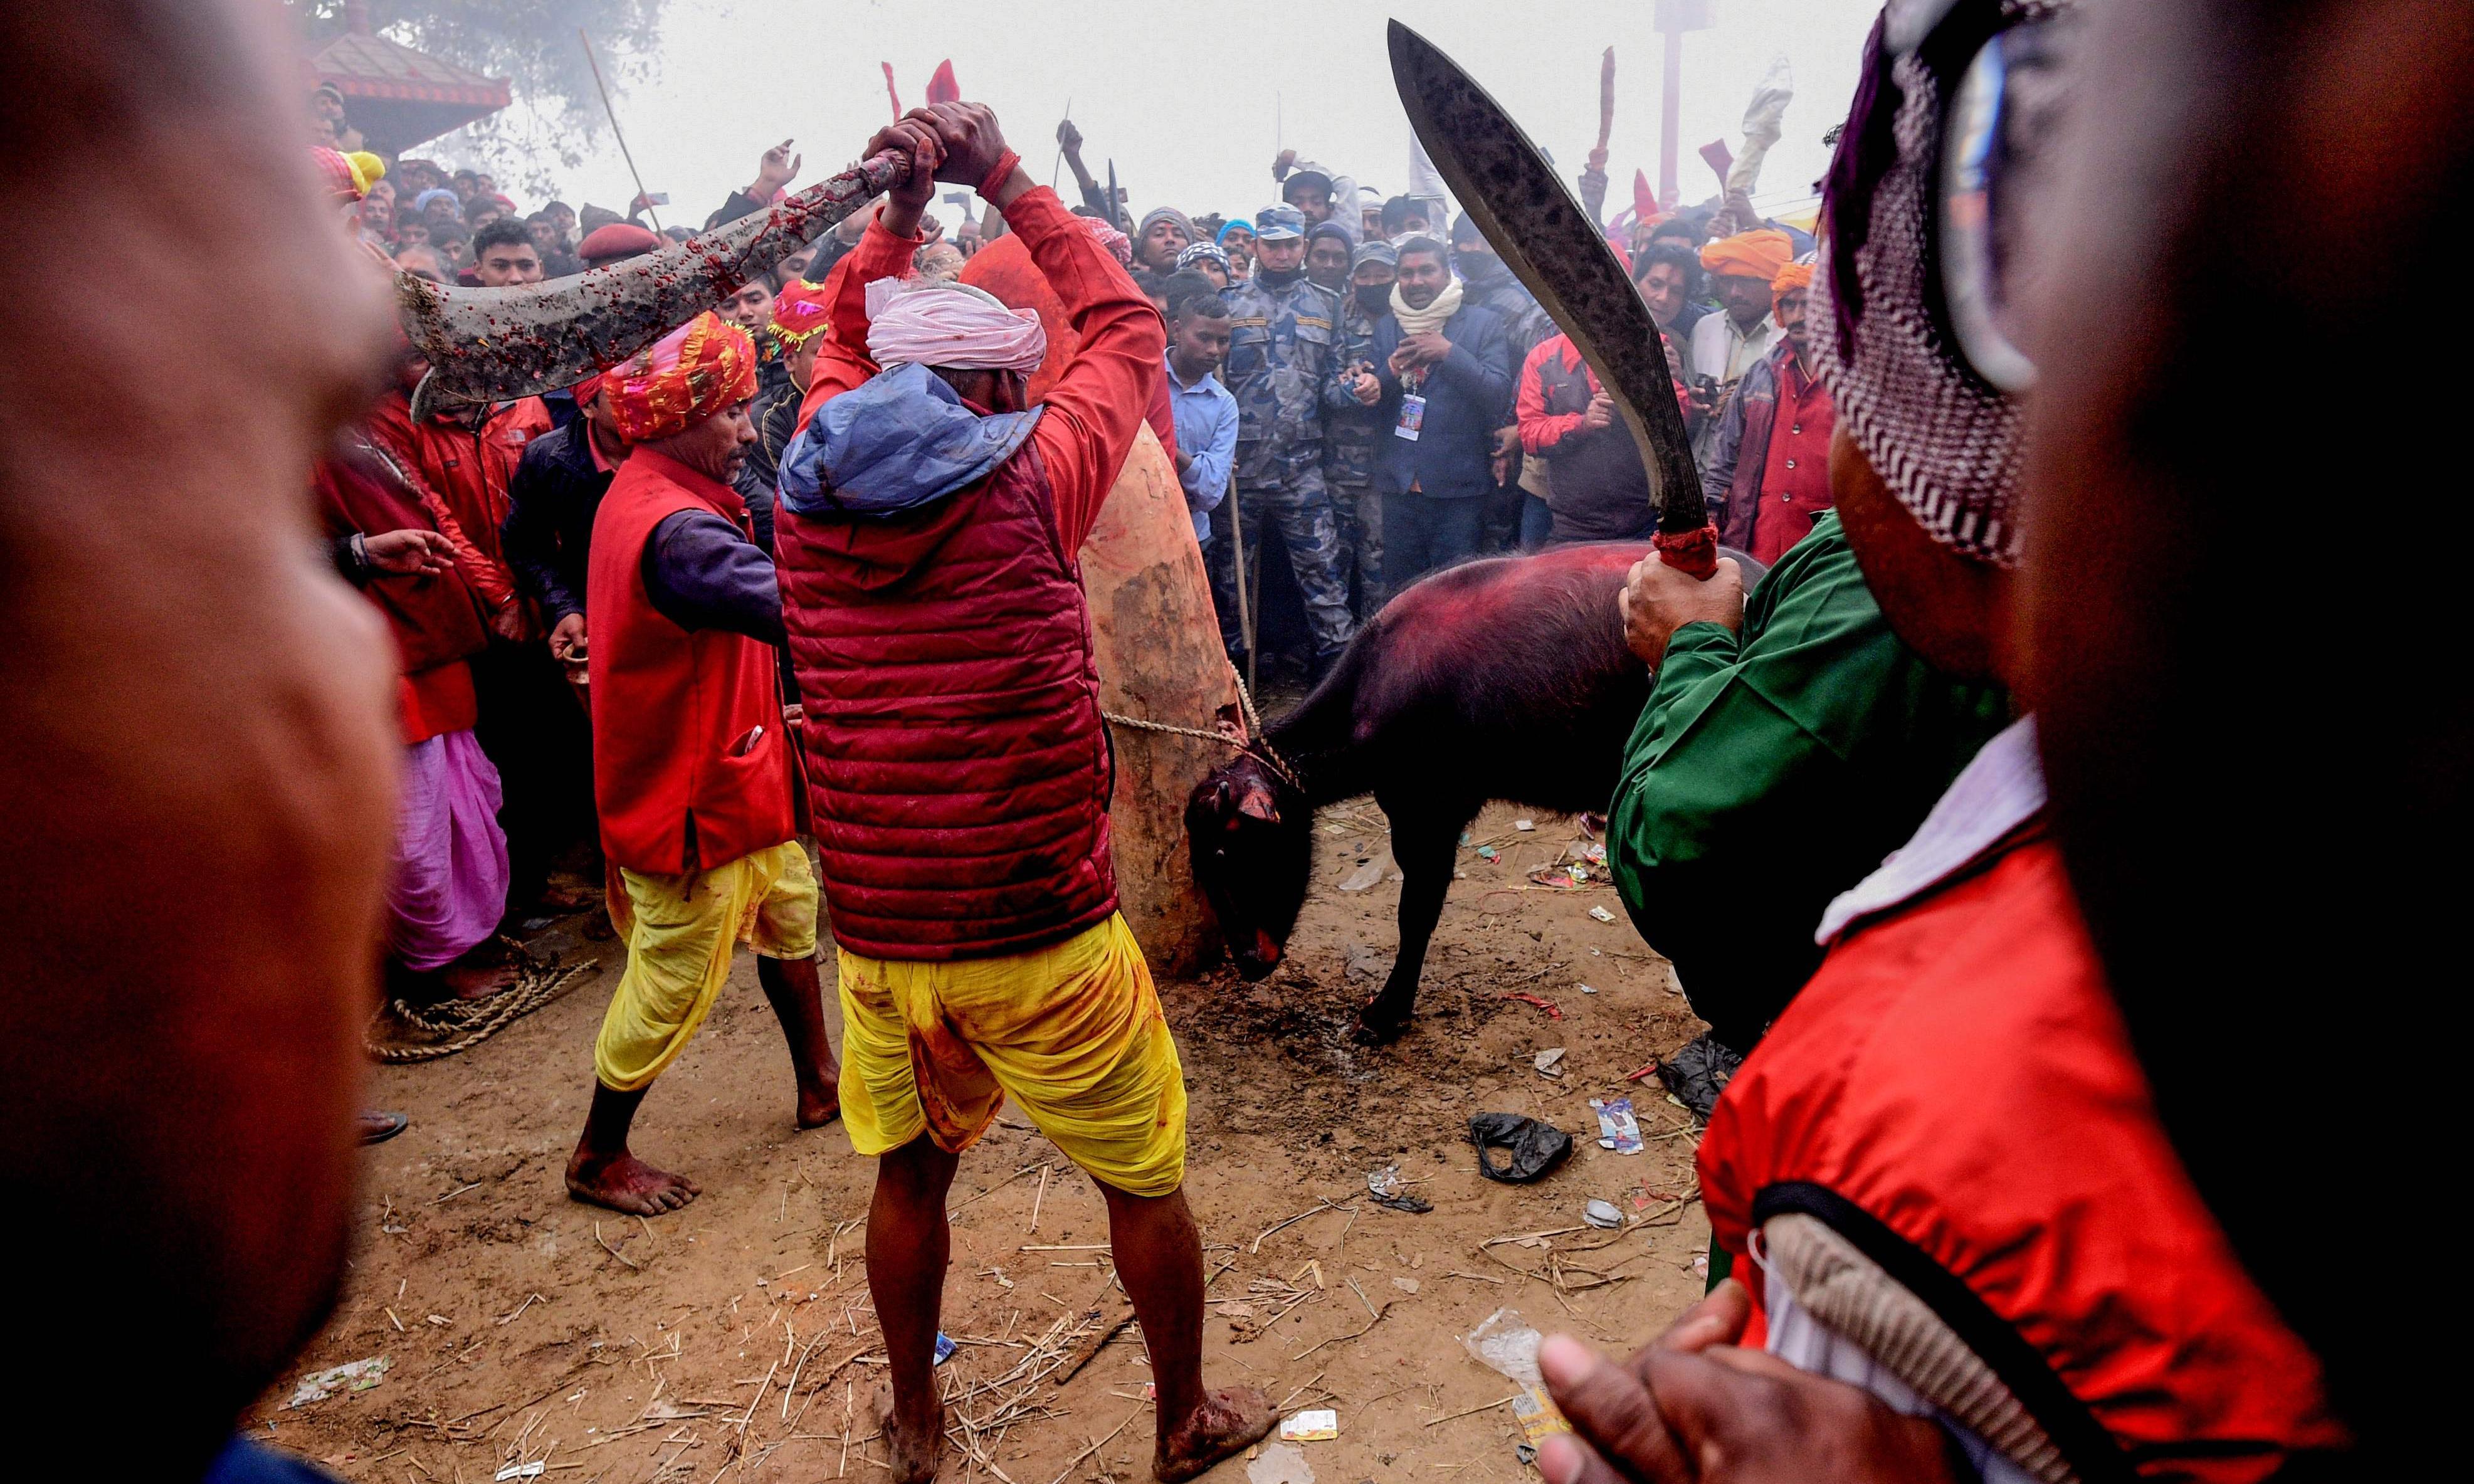 Nepal animal sacrifice festival pits devotees against activists